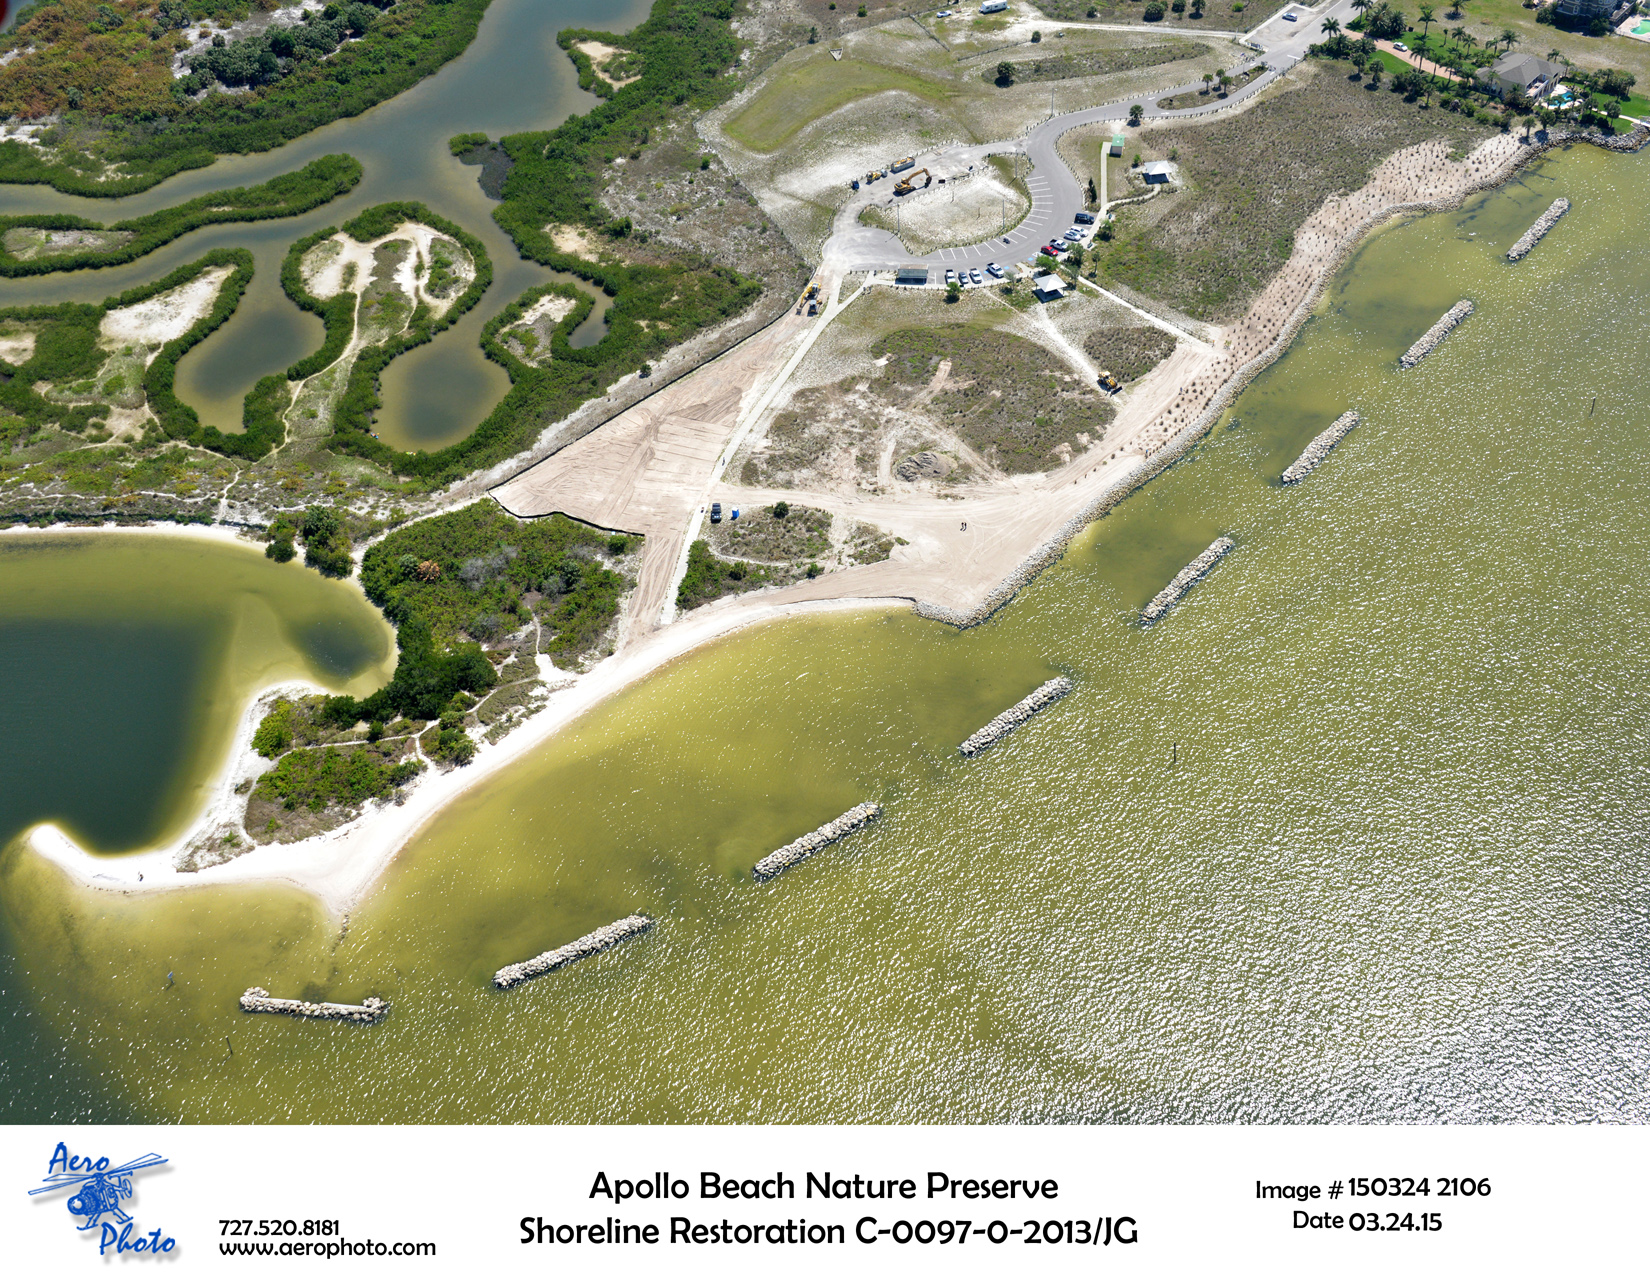 Apollo Beach Nature 1503242106.jpg